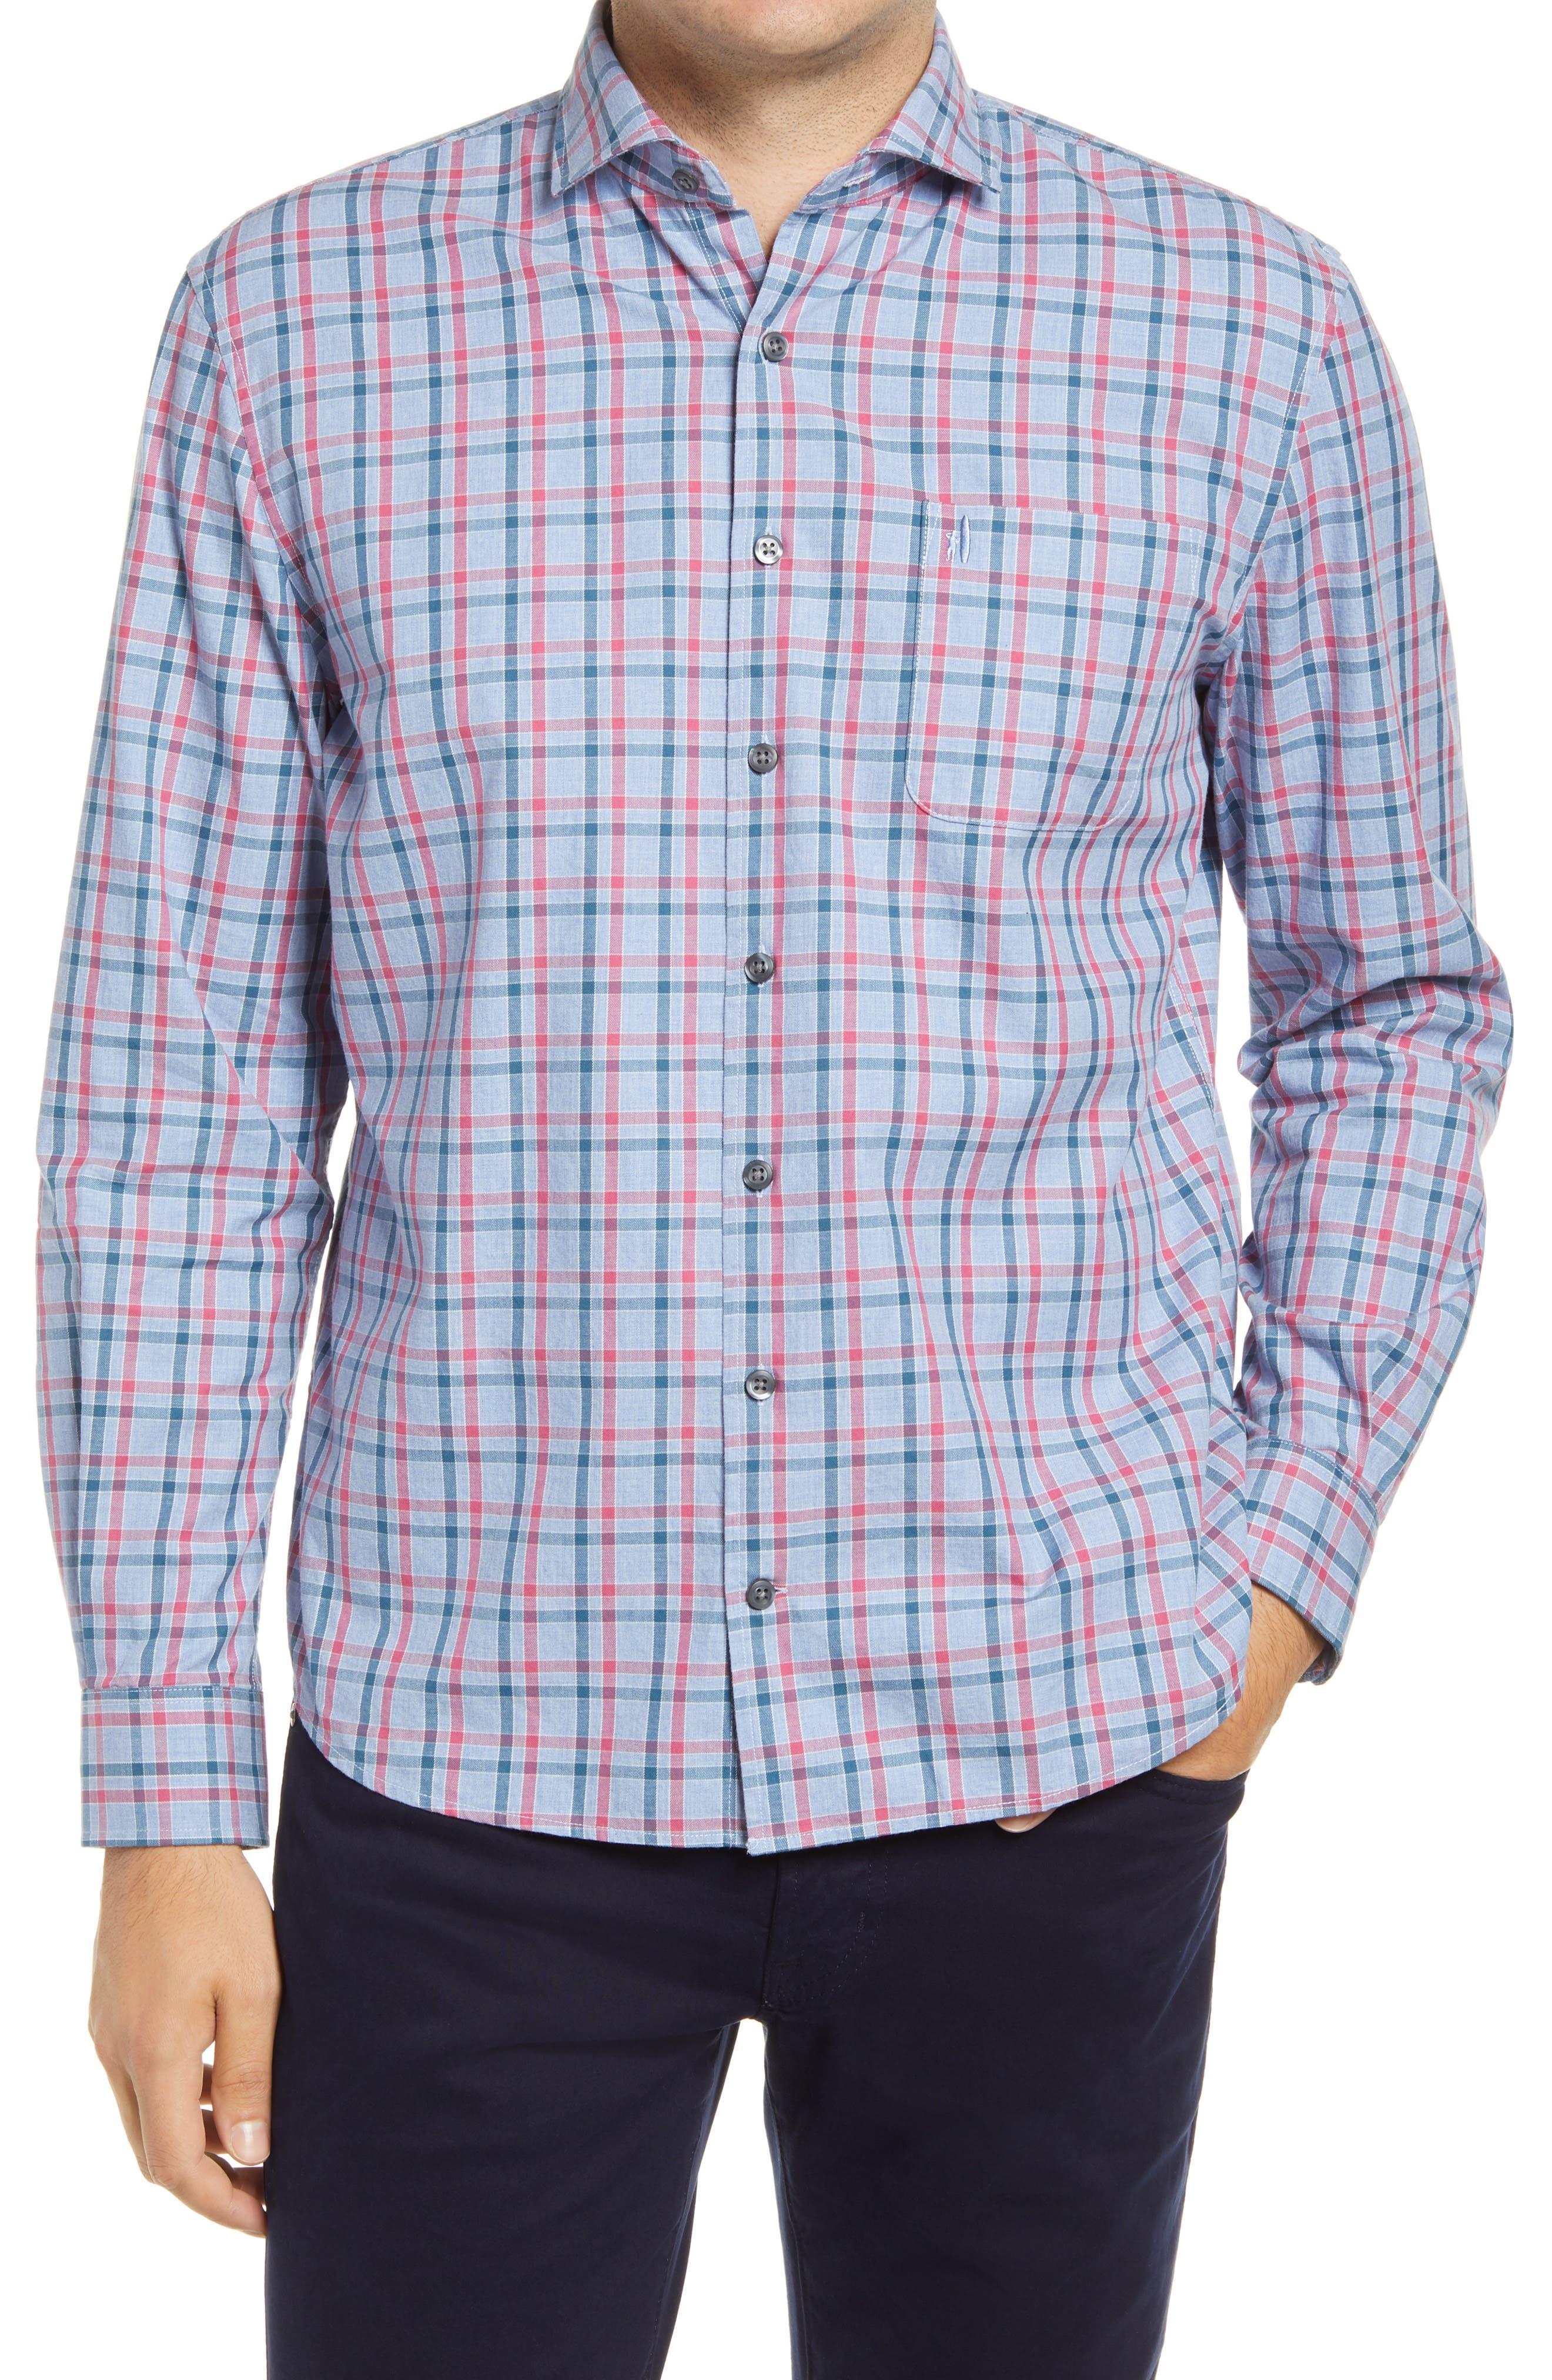 Hangin' Out Keller Plaid Flannel Button-Up Shirt